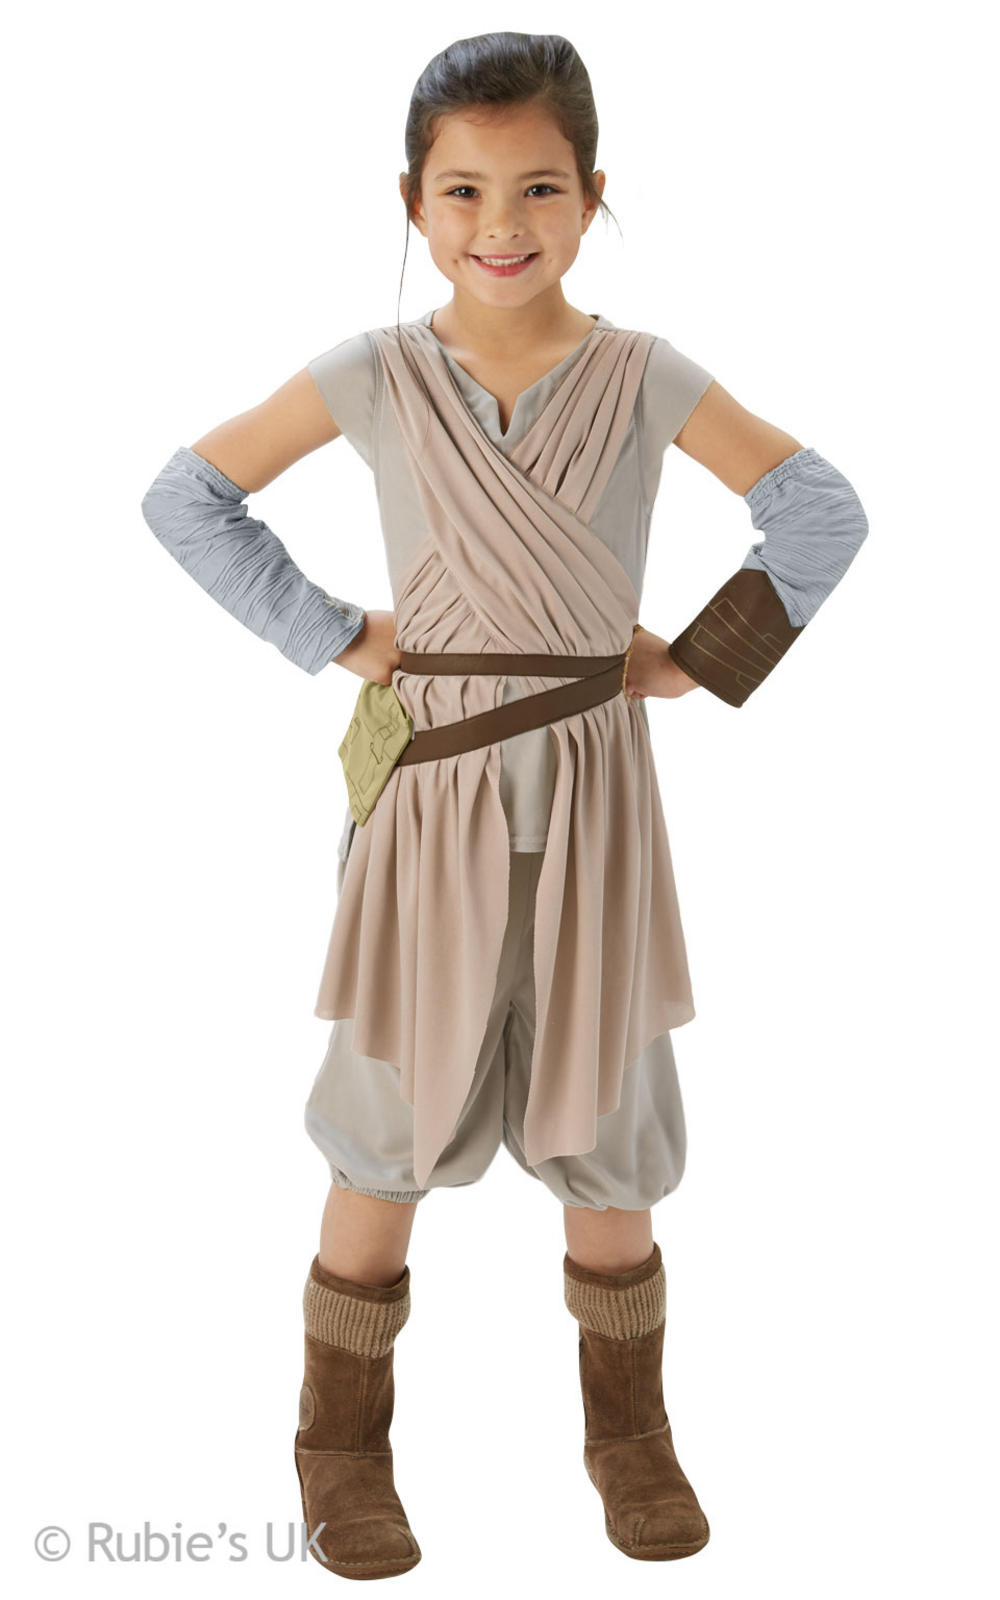 Deluxe Rey Girls The Force Awakens Star Wars Costume